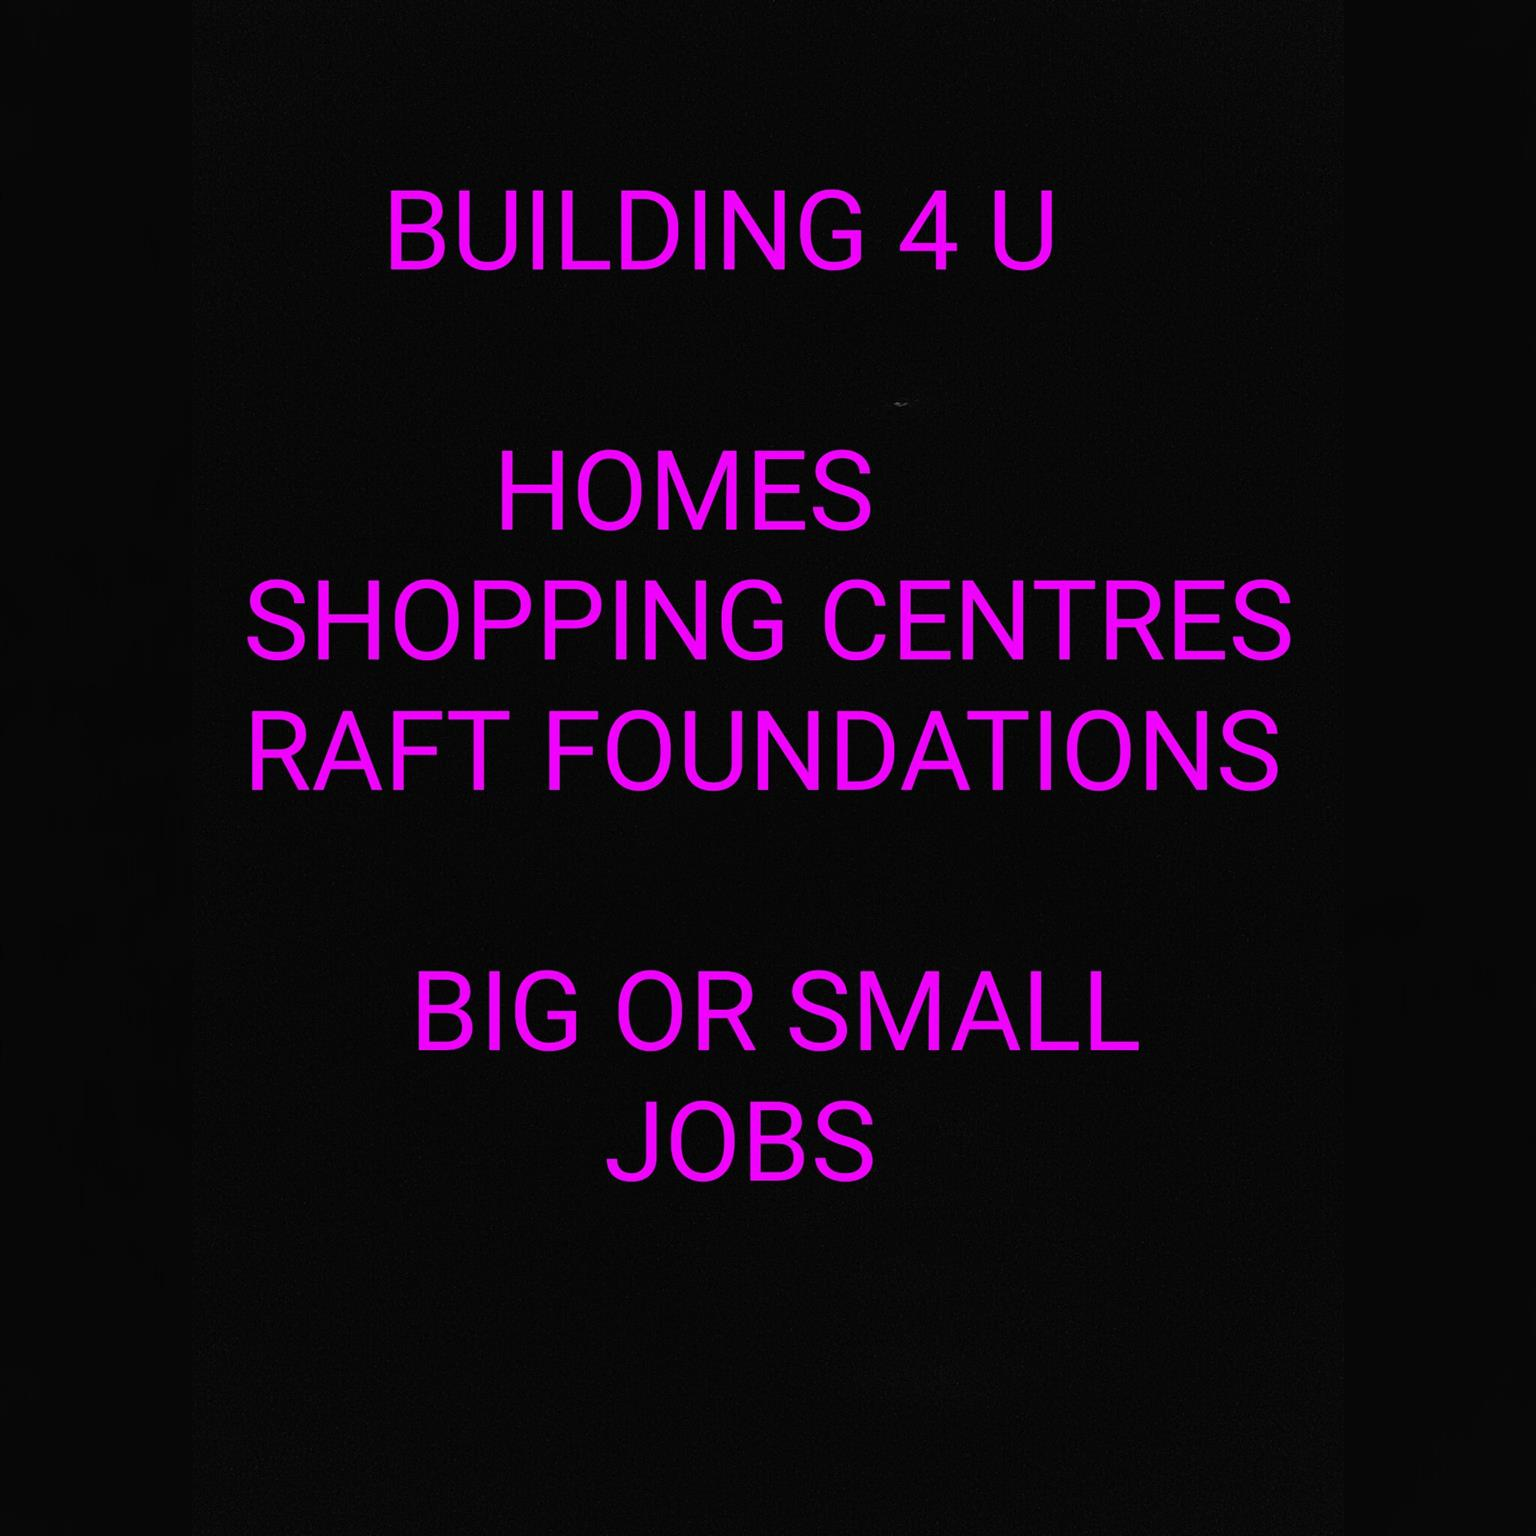 Building 4 U